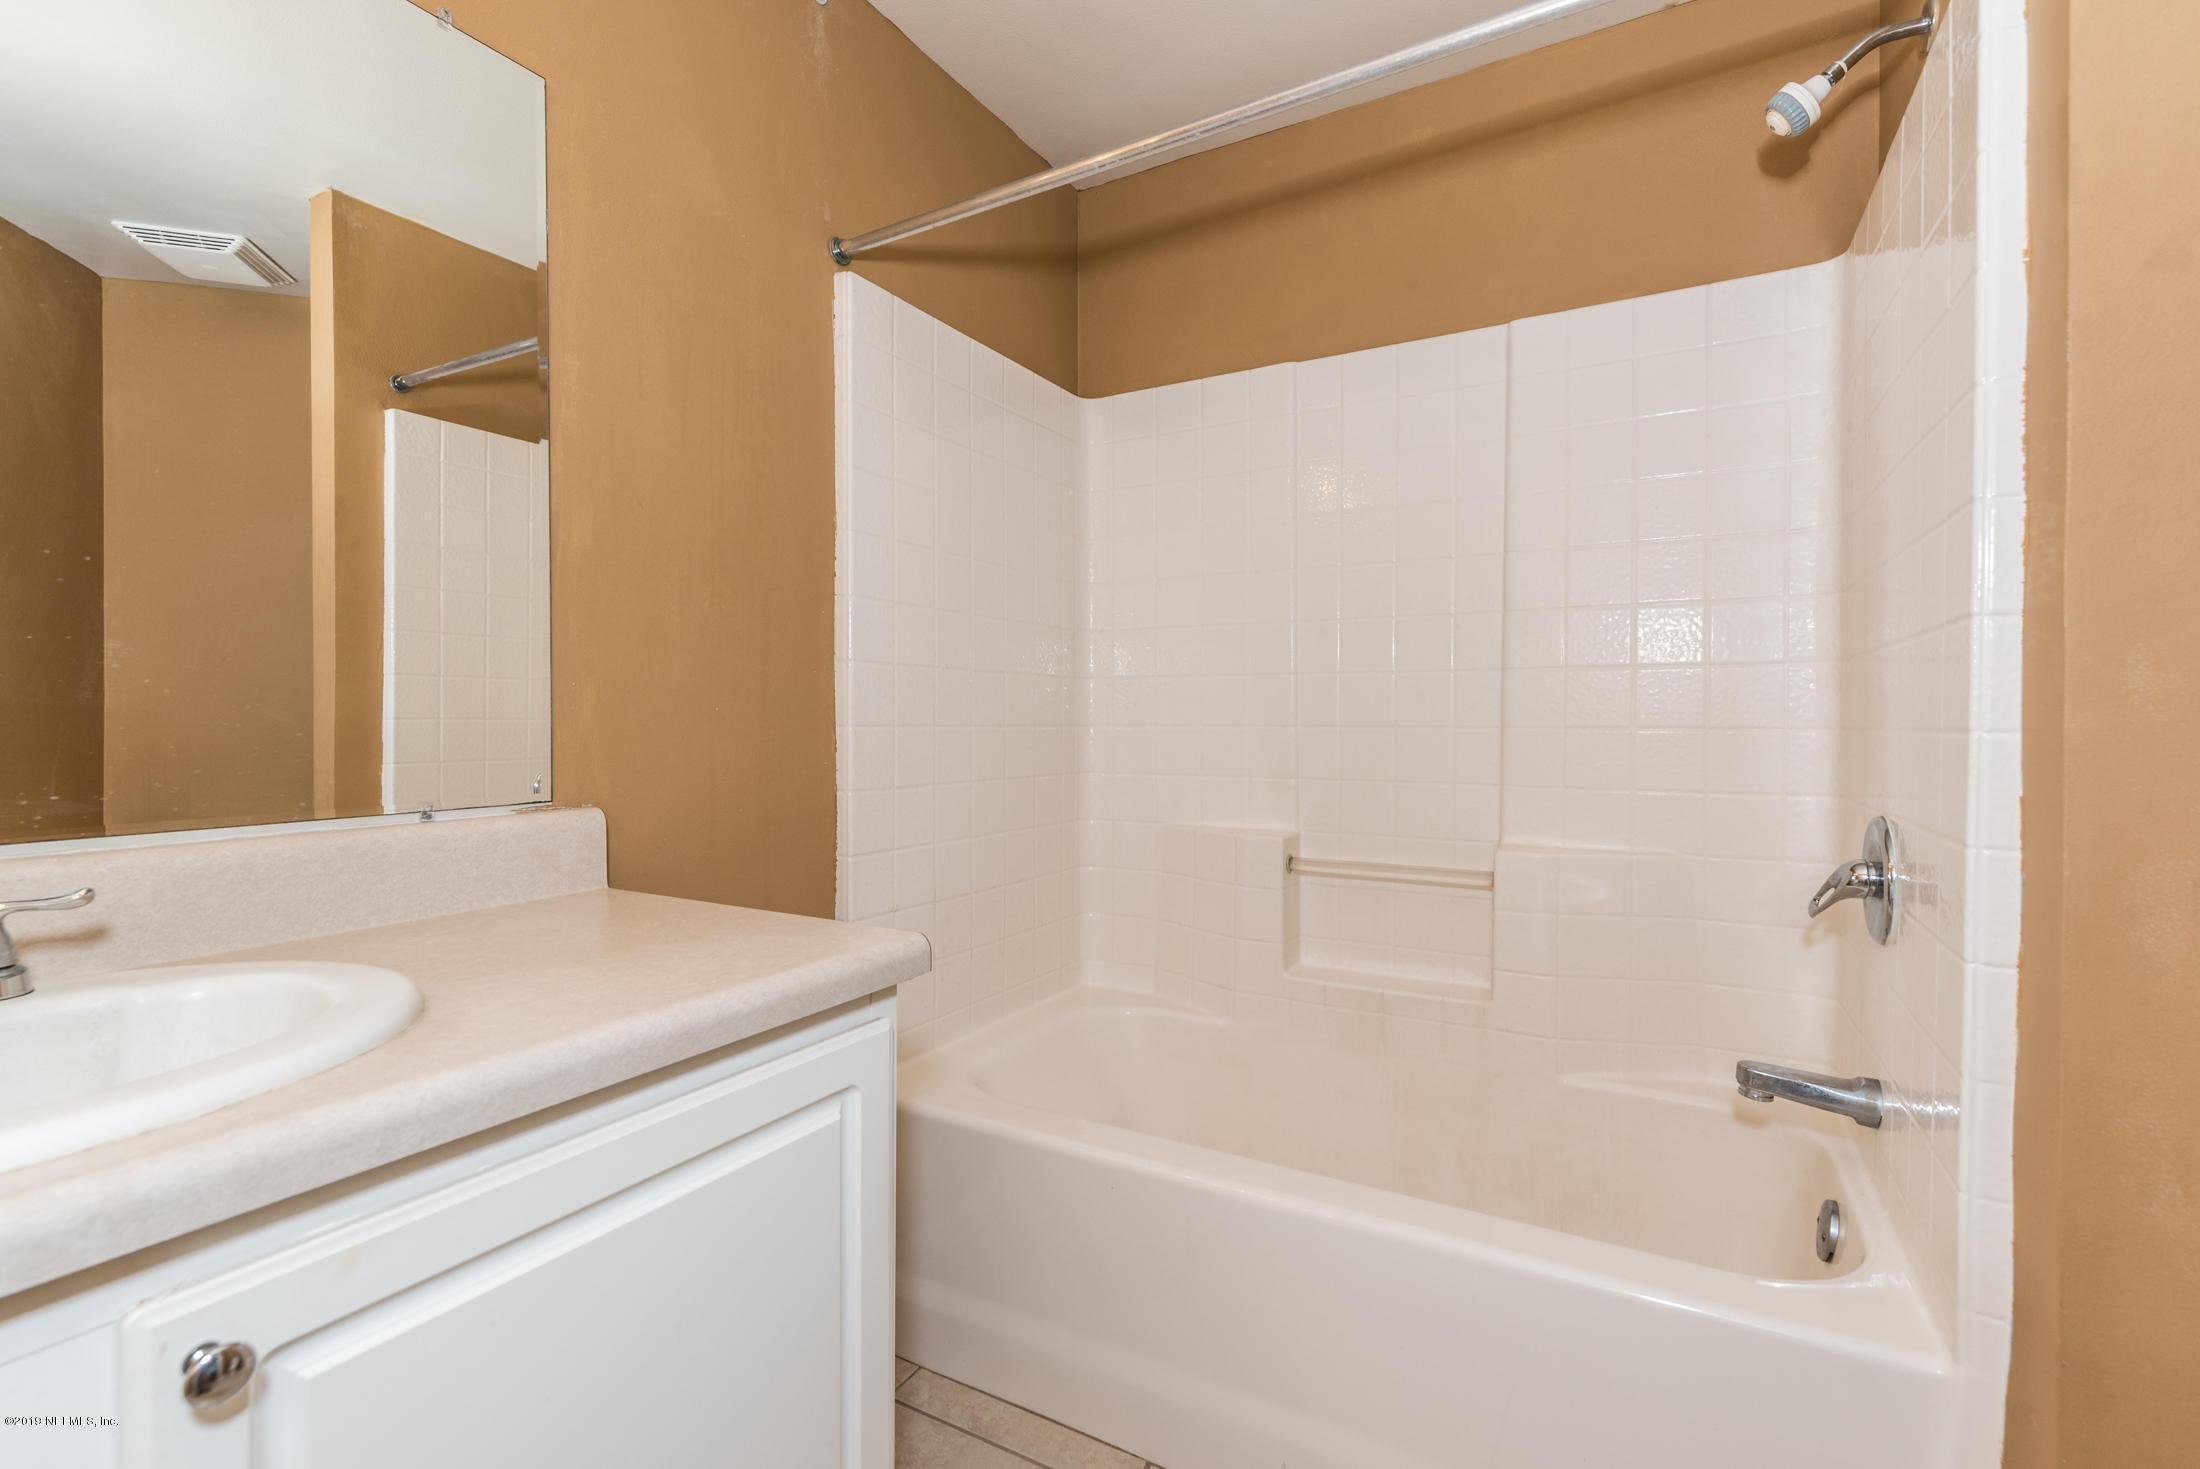 1080 BELLA VISTA, ST AUGUSTINE, FLORIDA 32084, 2 Bedrooms Bedrooms, ,2 BathroomsBathrooms,Condo,For sale,BELLA VISTA,1018960